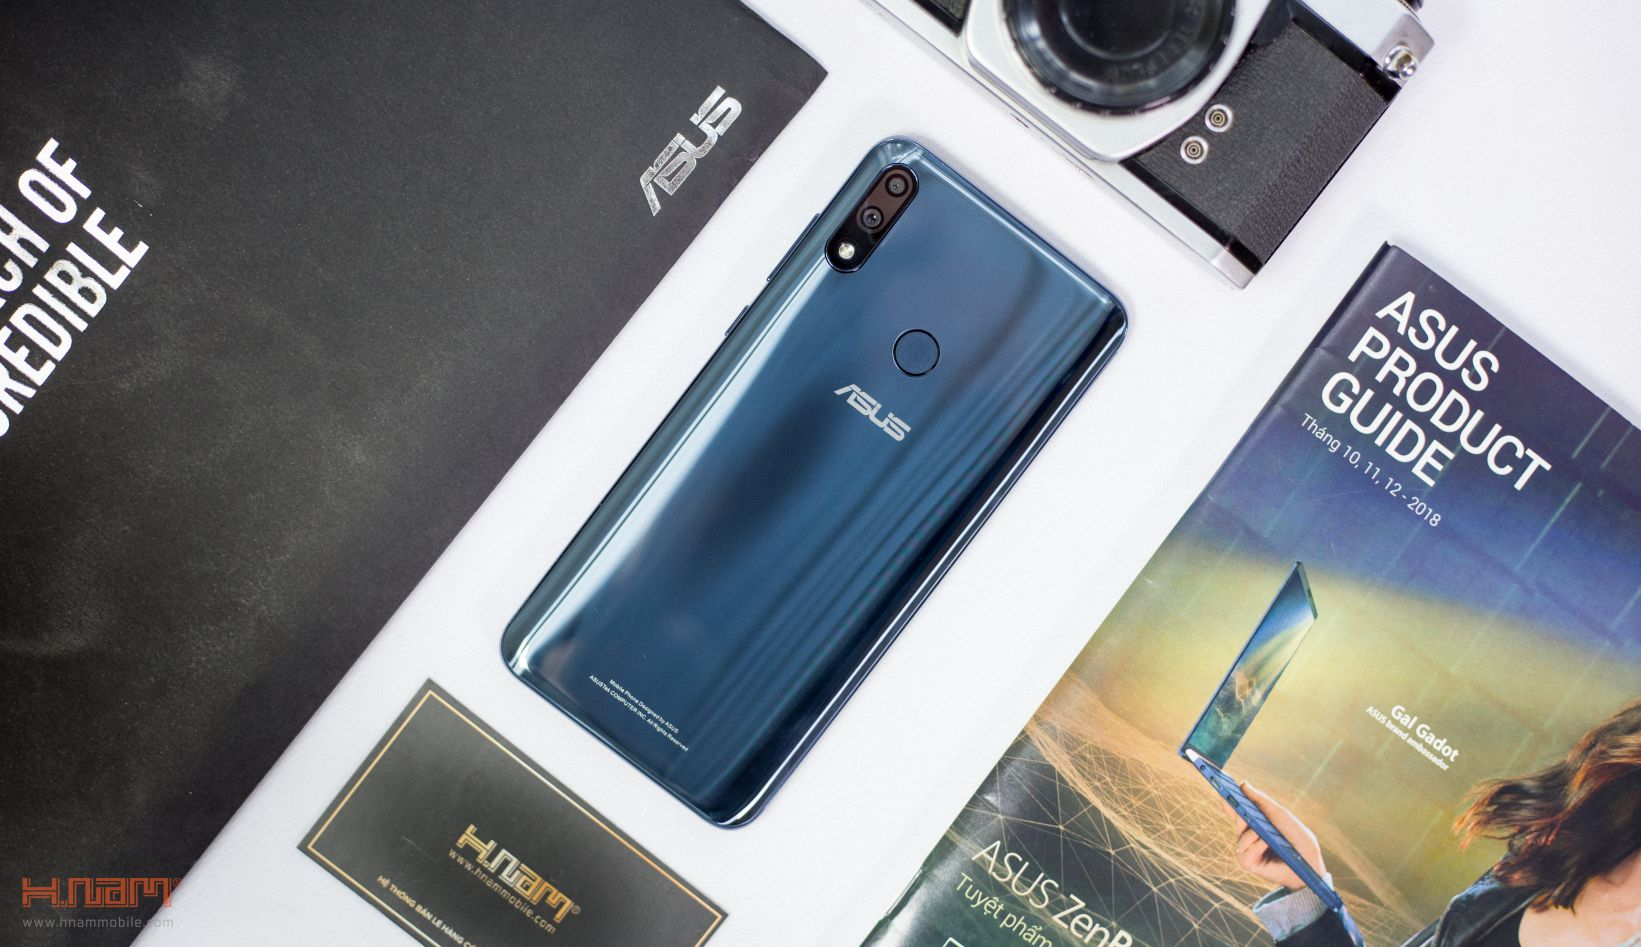 Trên tay Zenfone Max Pro M2: Snapdragon 660, pin 5000mAh, 5.29 triệu hình 1